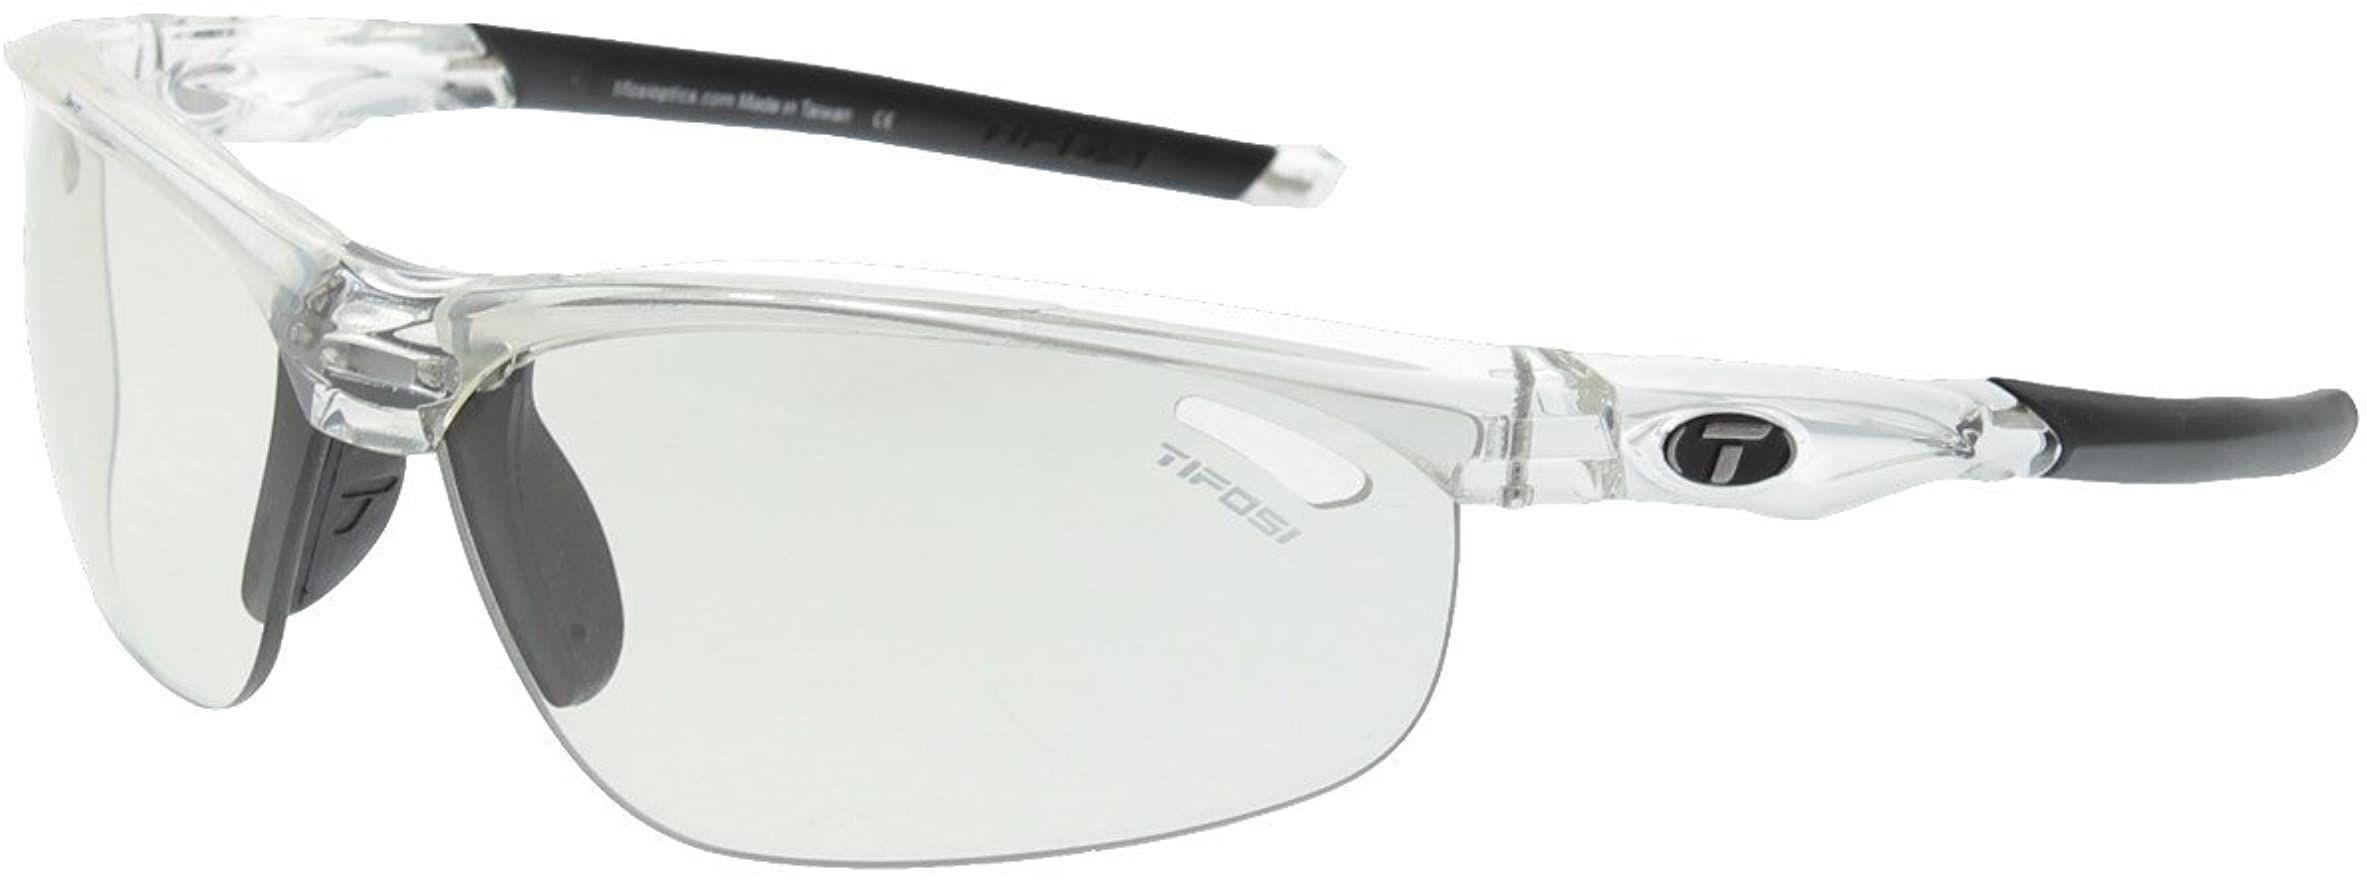 Tifosi Veloce Fototec Photochromic Sunglasses